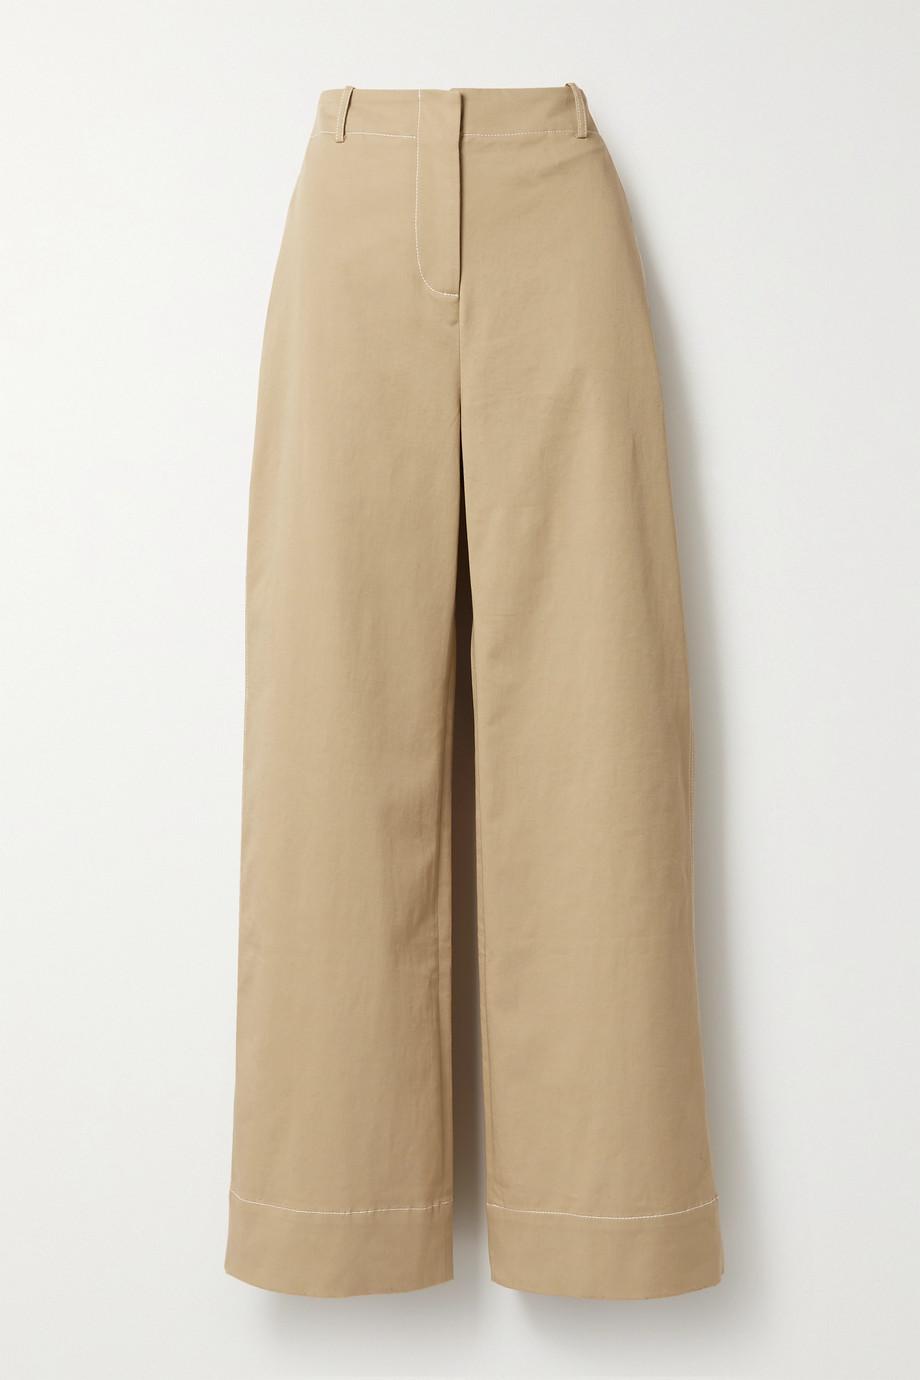 ANNA QUAN Hugo cotton-blend twill straight-leg pants